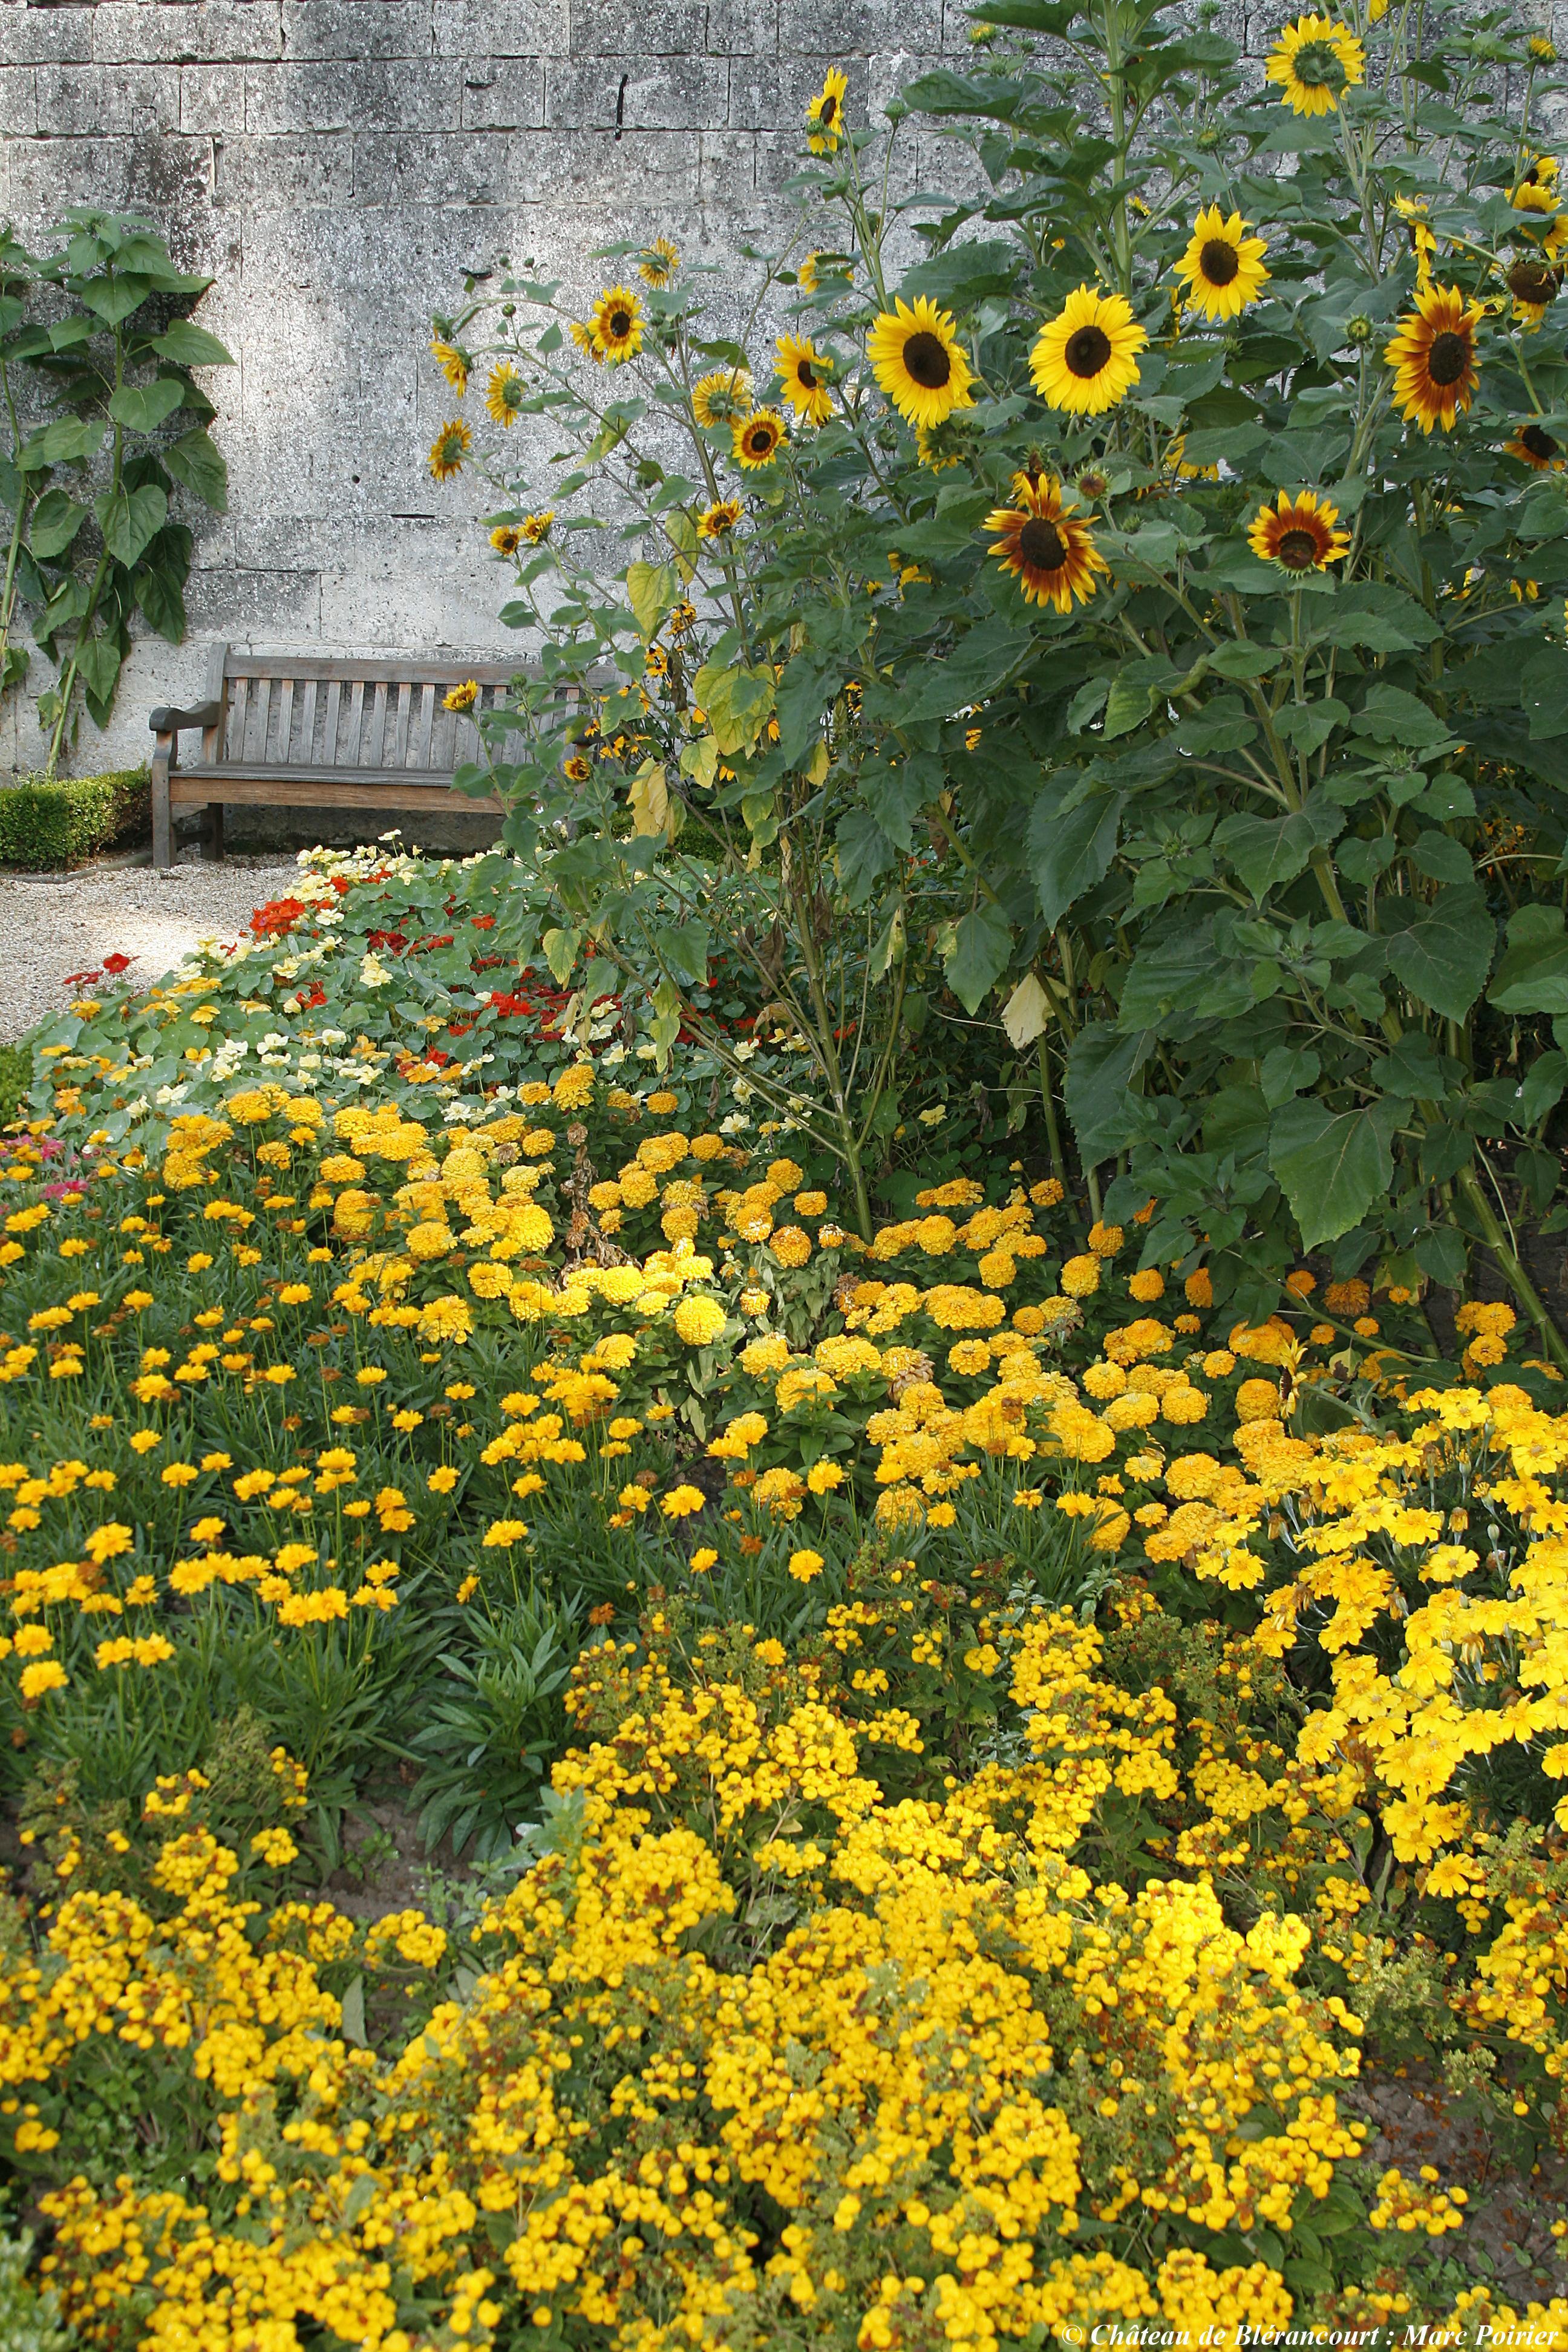 Jardin jaune du Musée franco-américain du château de Blérancourtcourt